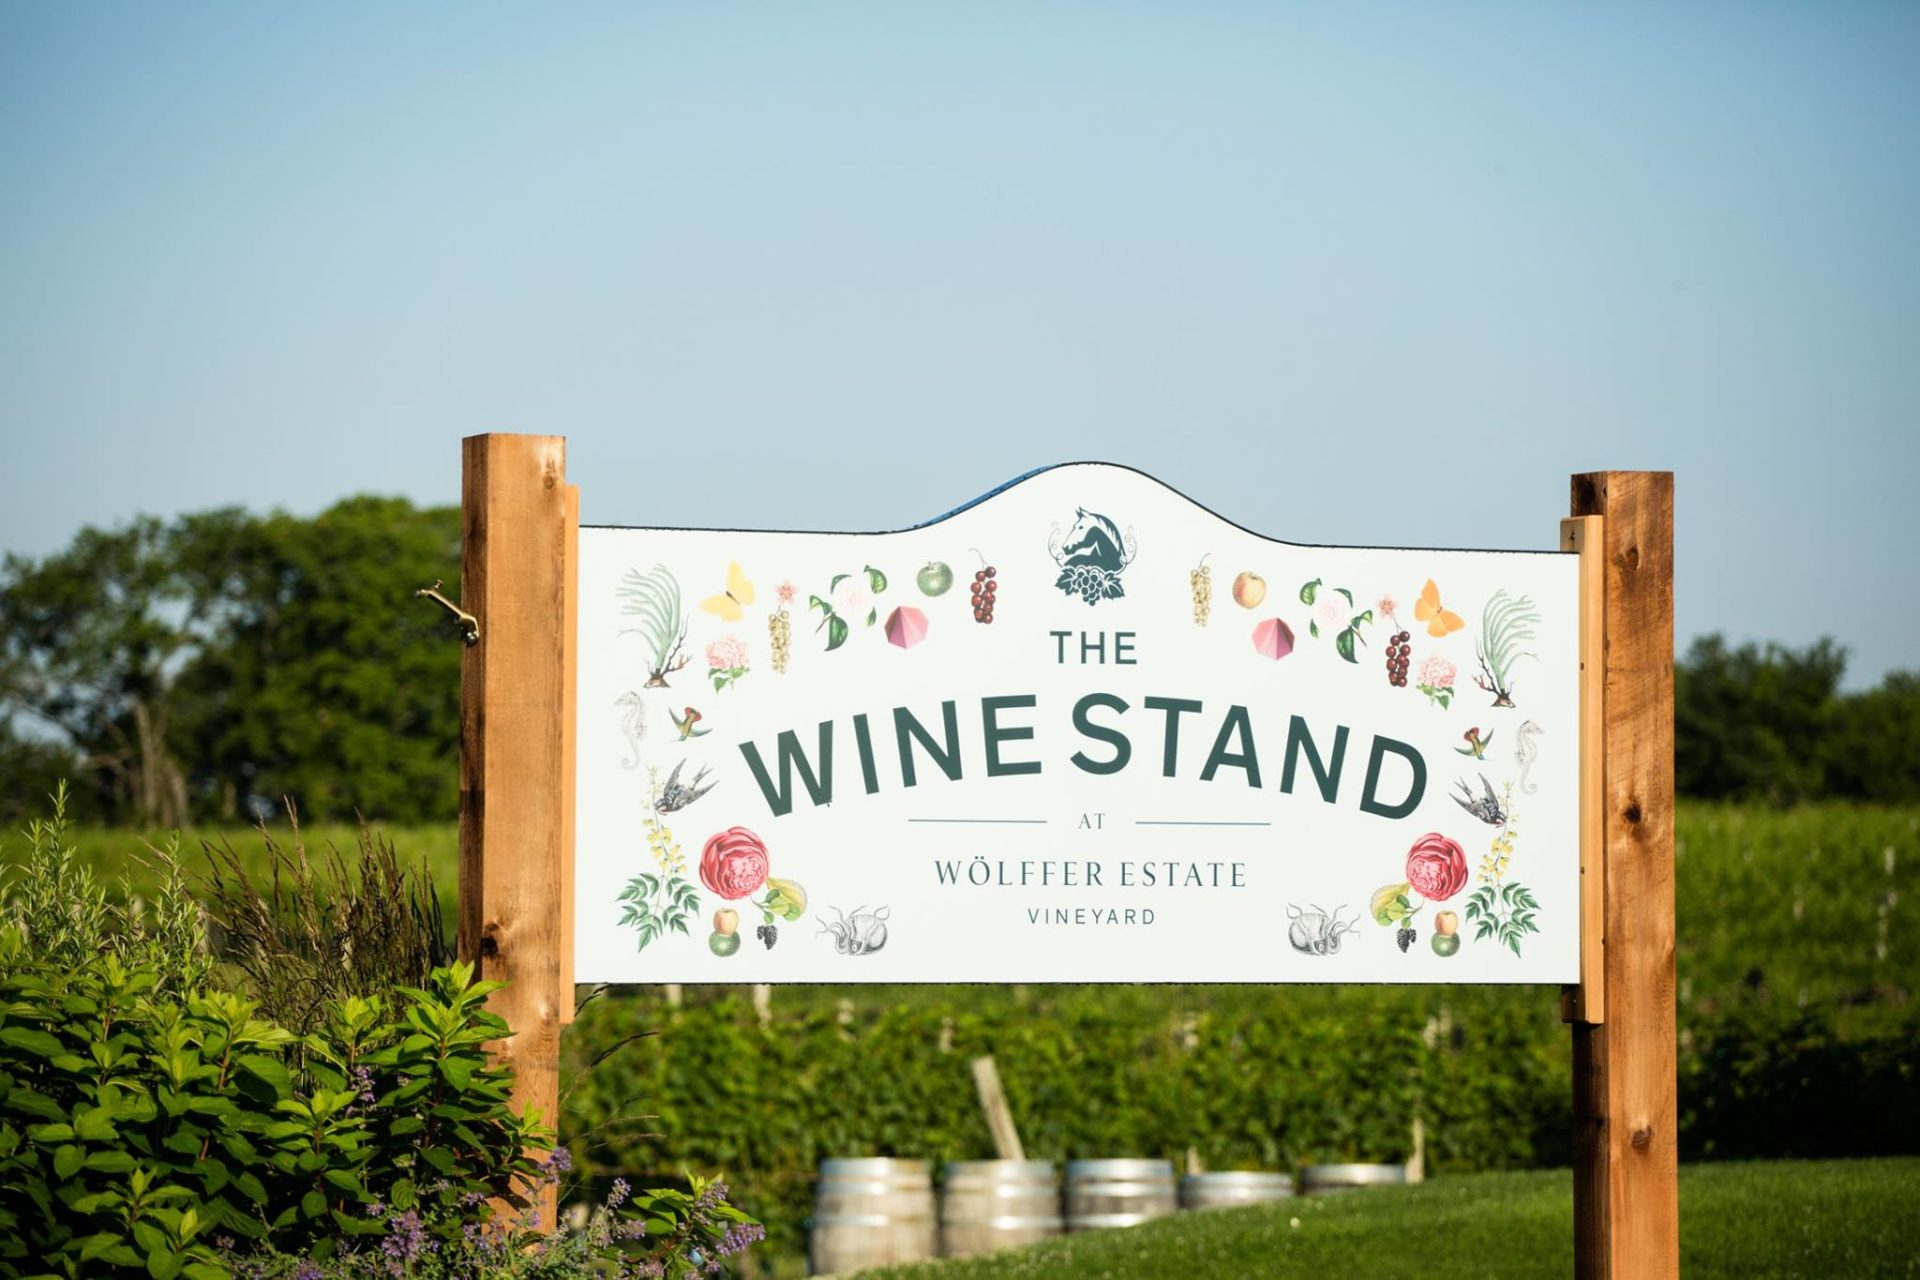 Wine Stand sign. Photo by Wölffer Estates via Facebook.